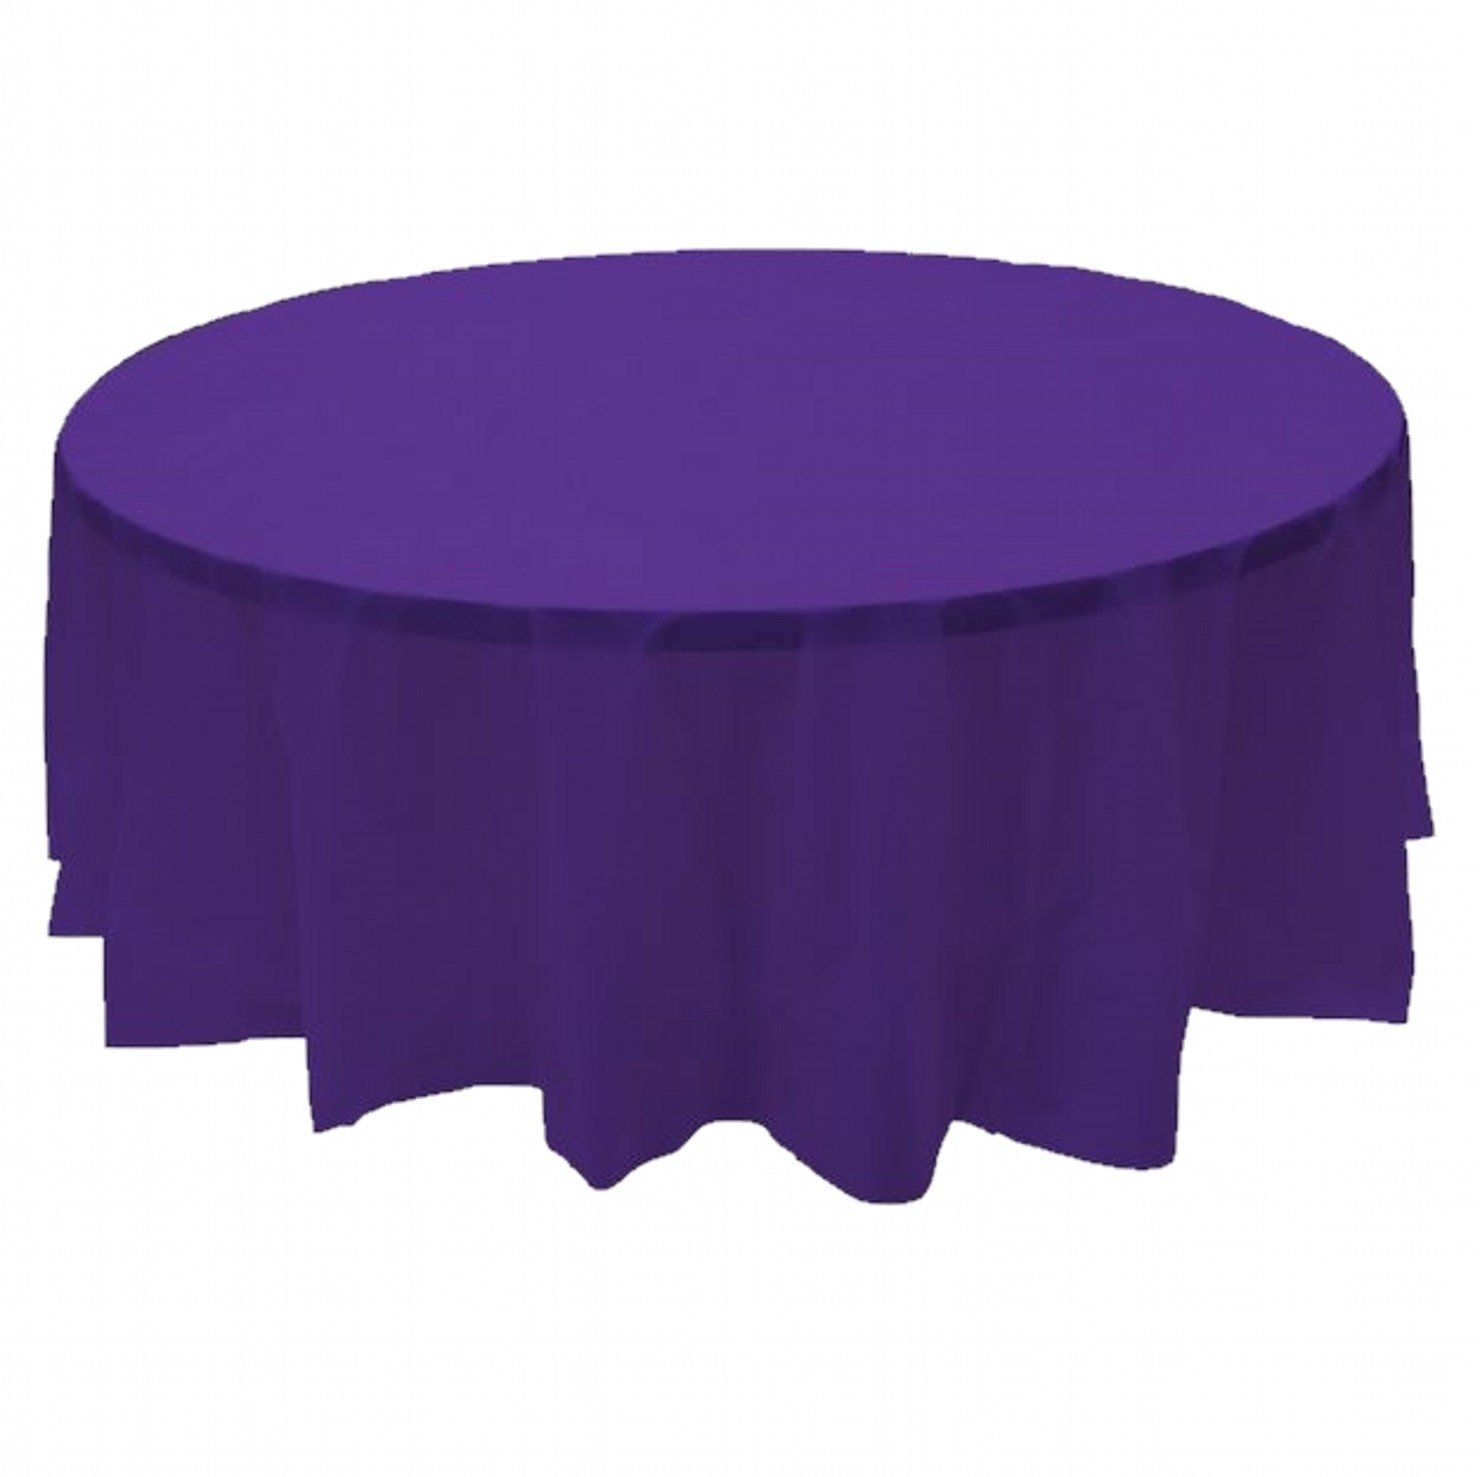 24 pcs (1 case) of Plastic Heavy Duty Premium Round tablecloths 84'' Diameter Table Cover - Purple